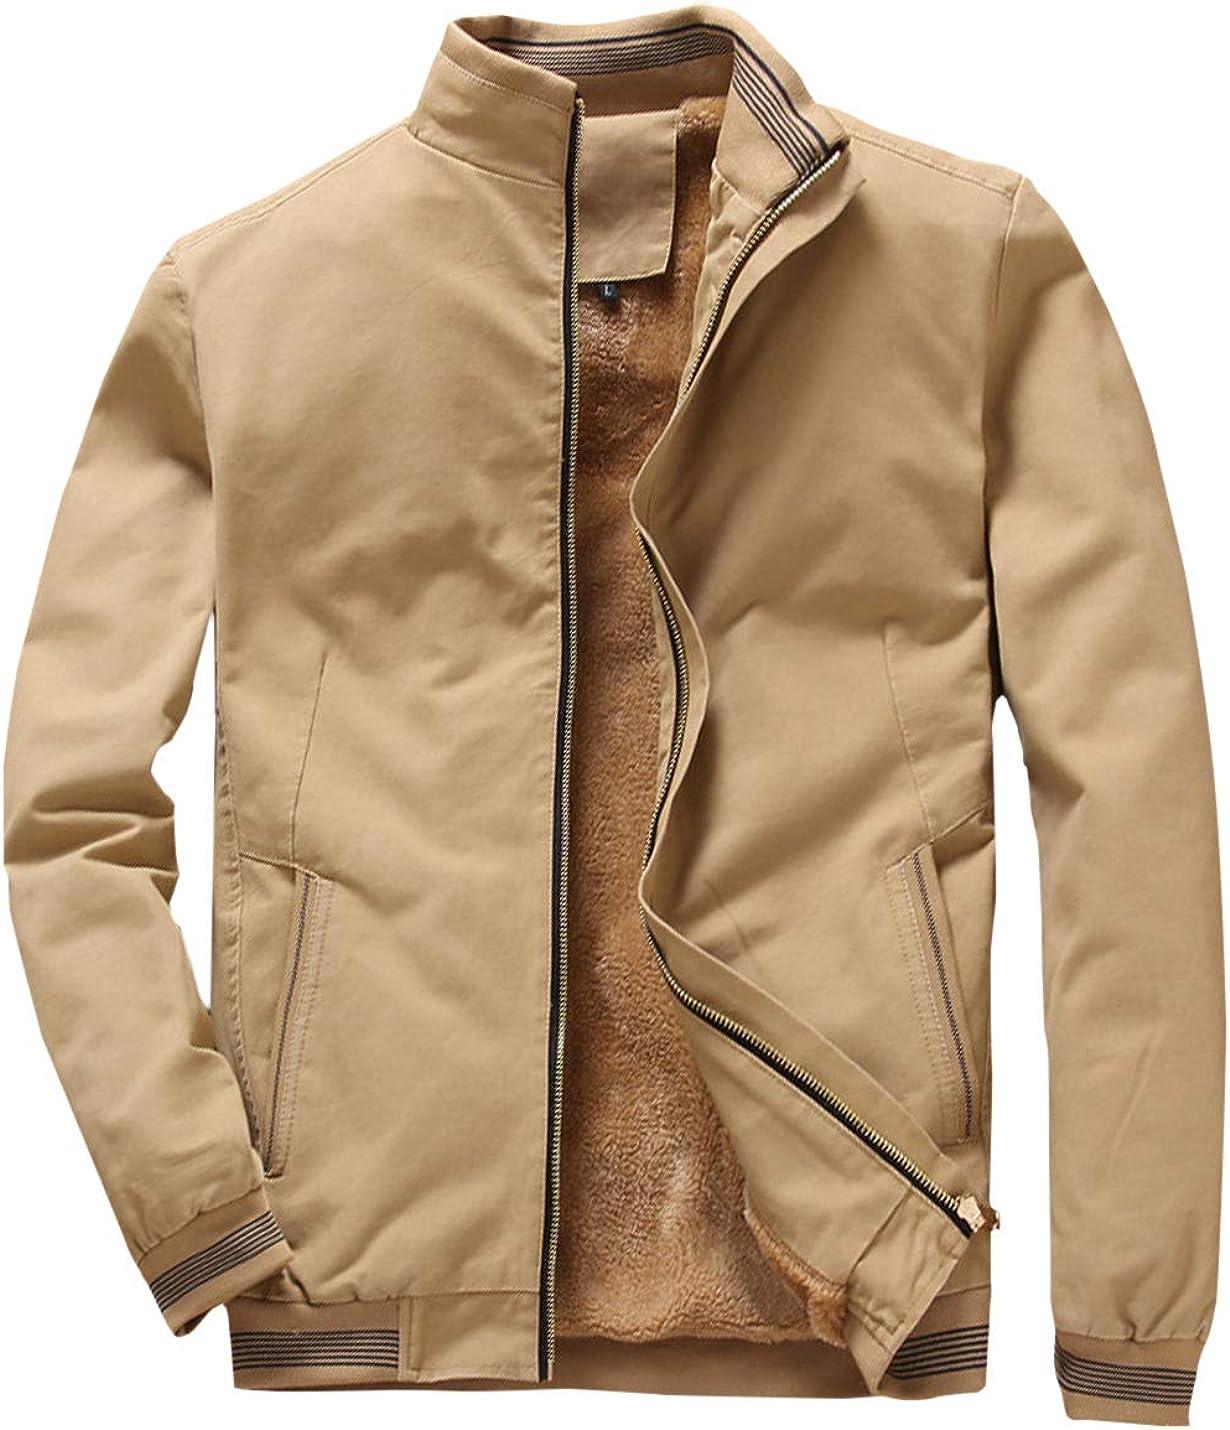 Yeokou Mens Fleece Lined Warm Solid Casual Windbreaker Stand Collar Bomber Jackets